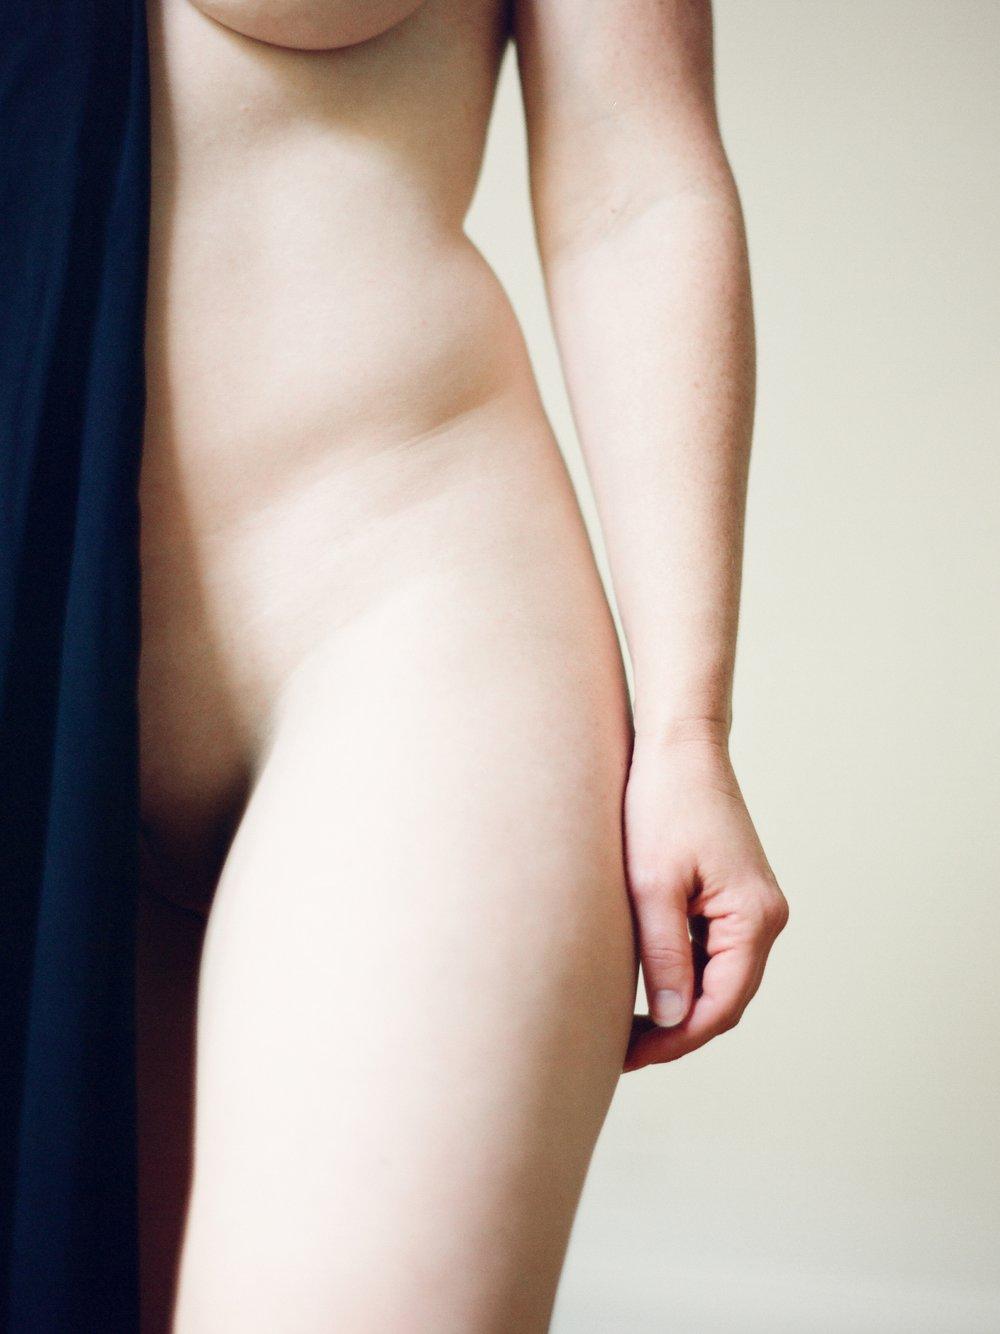 tallahassee_boudoir_photographer_shannon_griffin_0001.jpg